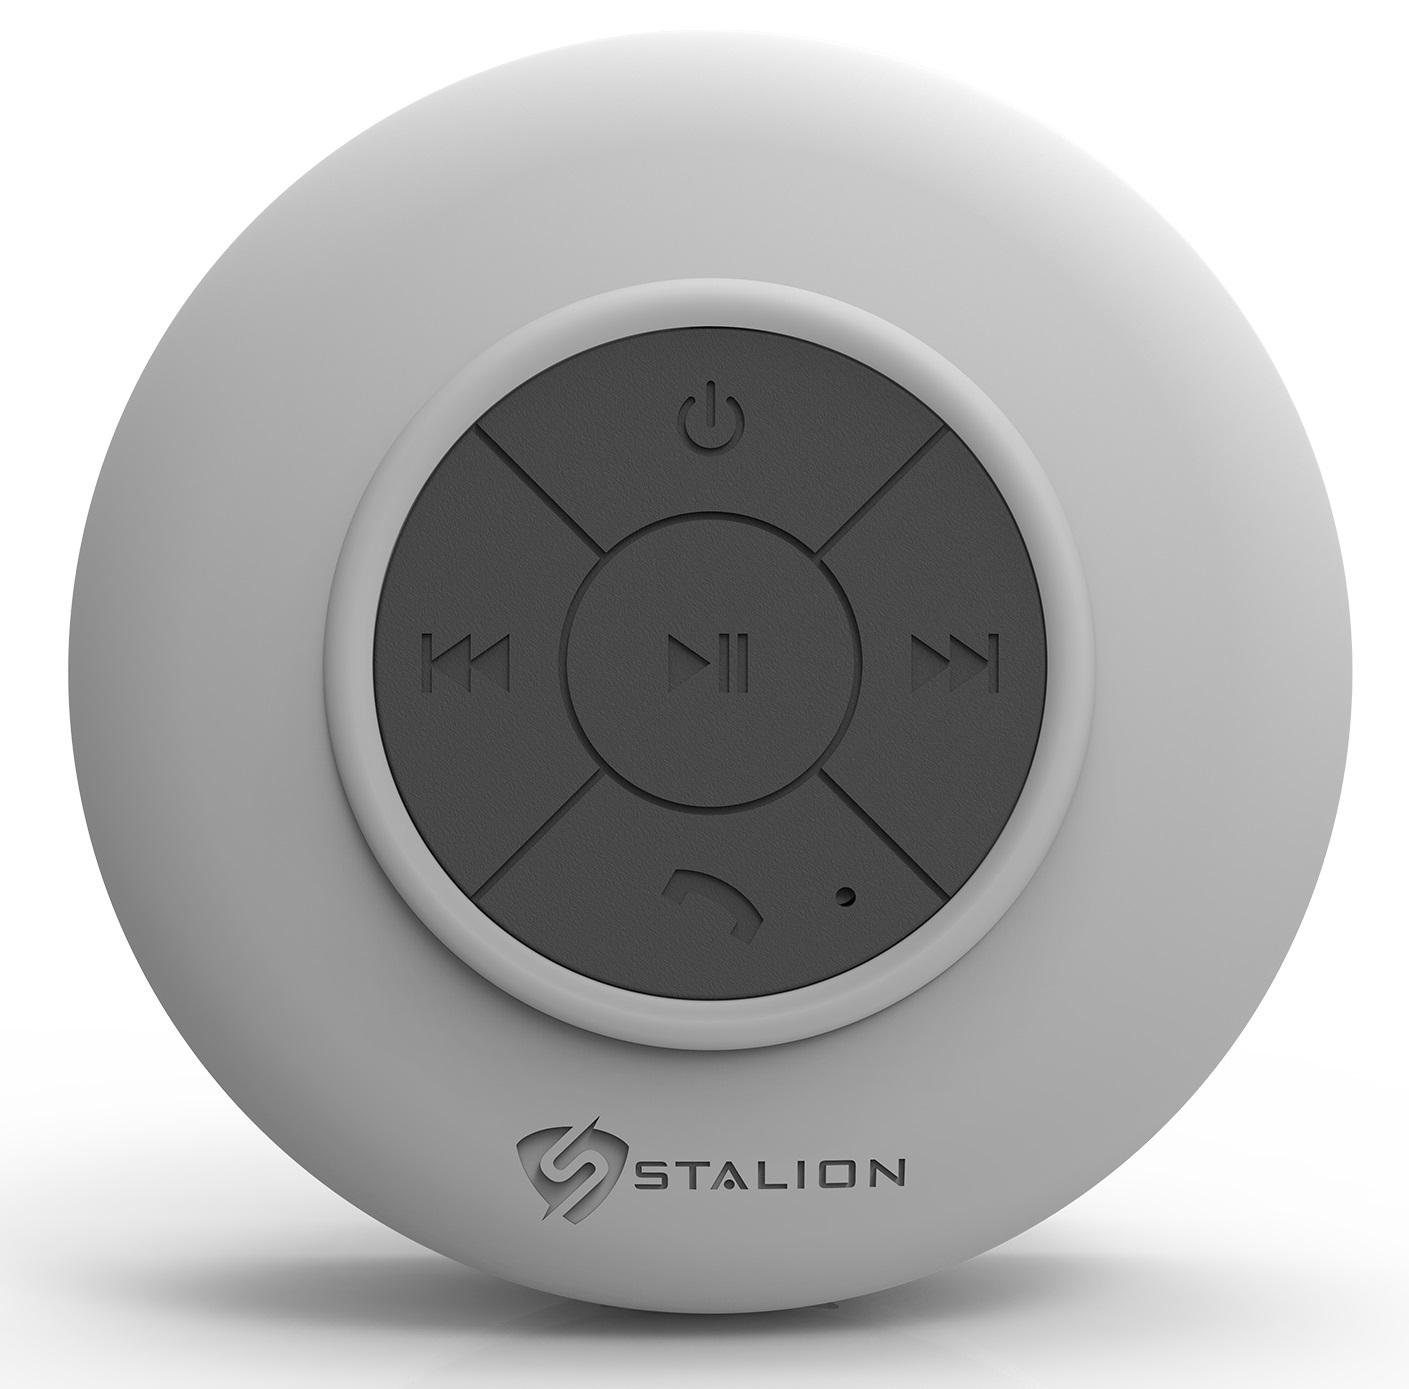 Stalion® Sound Universal Wireless Portable Waterproof Bluetooth Shower Speaker